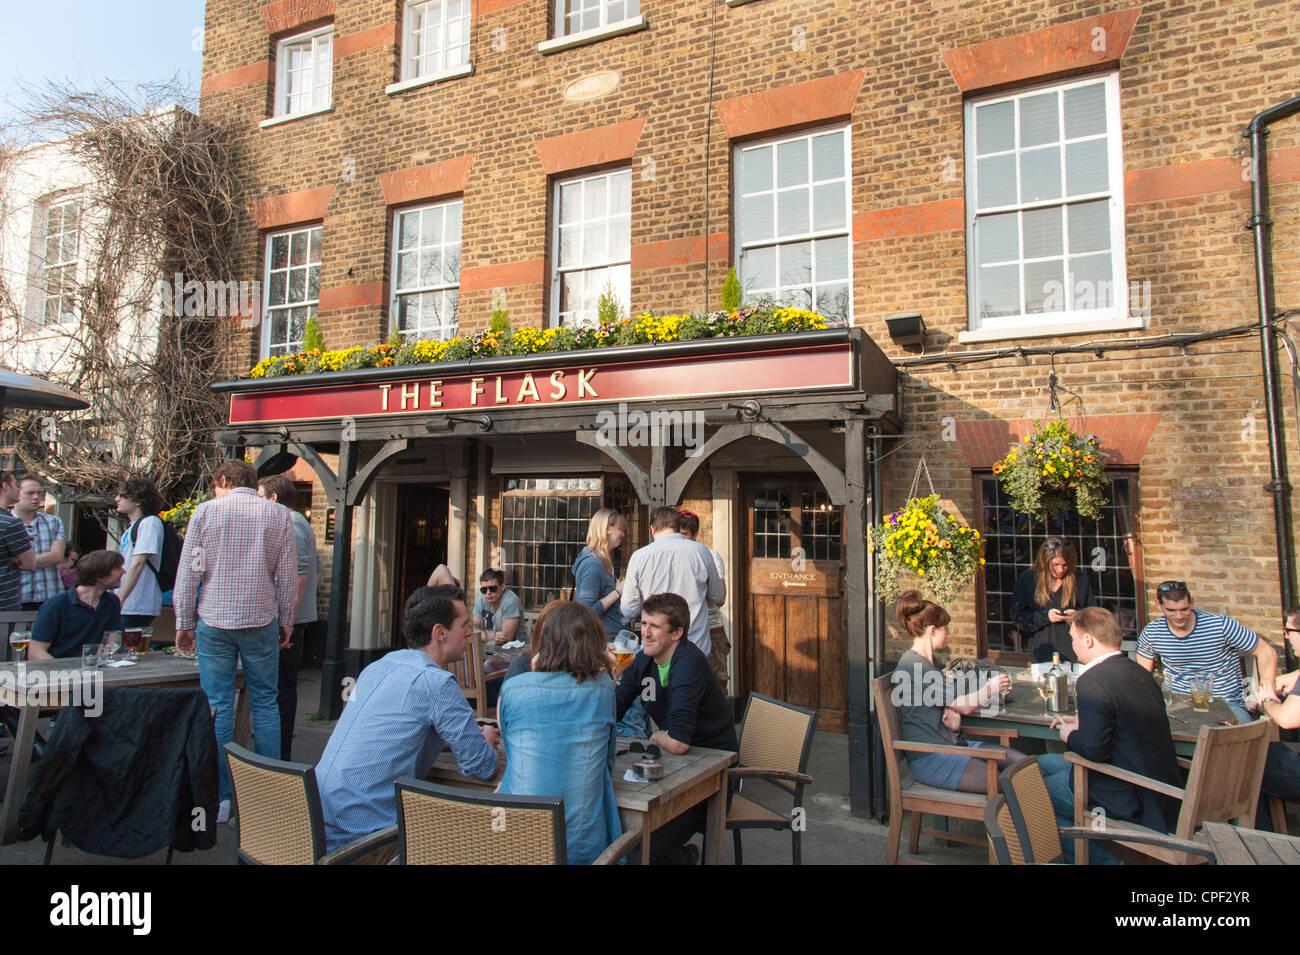 Beer garden of The Flask pub, Highgate, London, England, UK - Stock Image